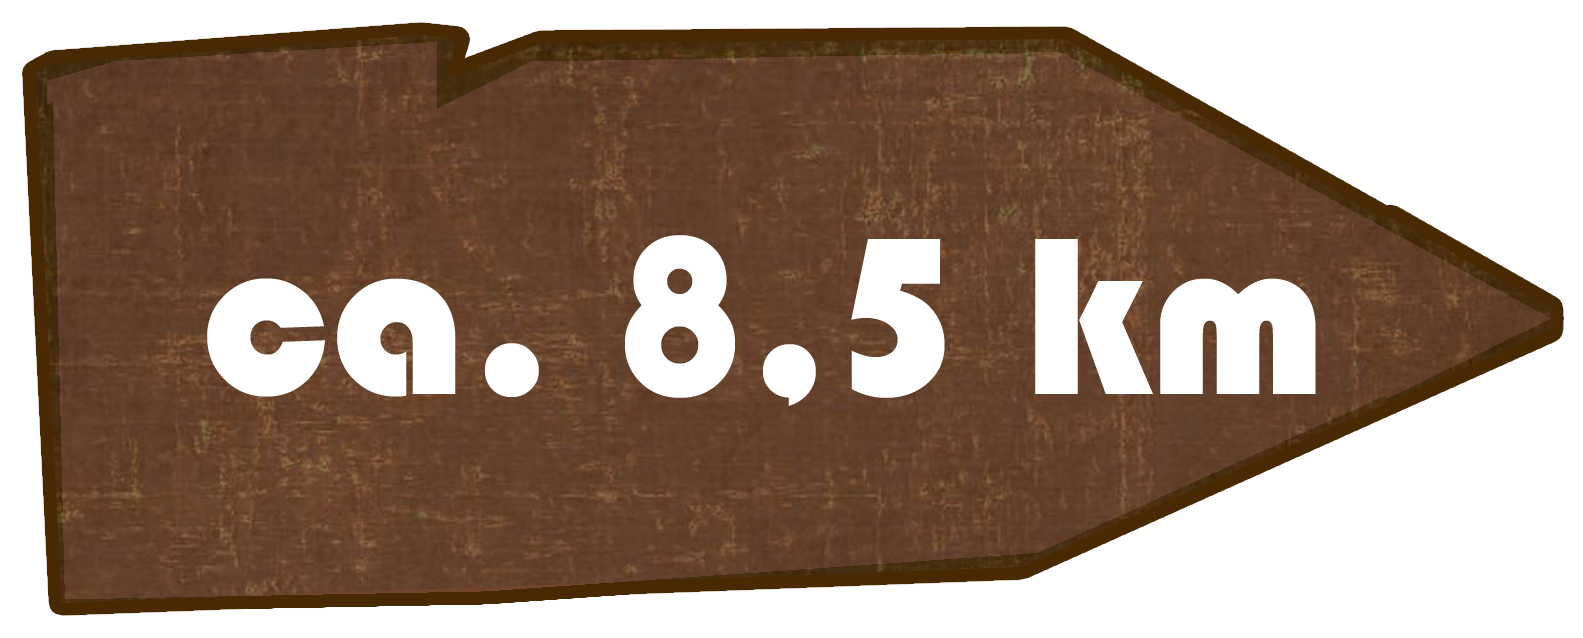 Kilometer Obercunnersdorf - Sonnenberg - Otthenhain - Niedercunnersdorf - Obercunnersdof